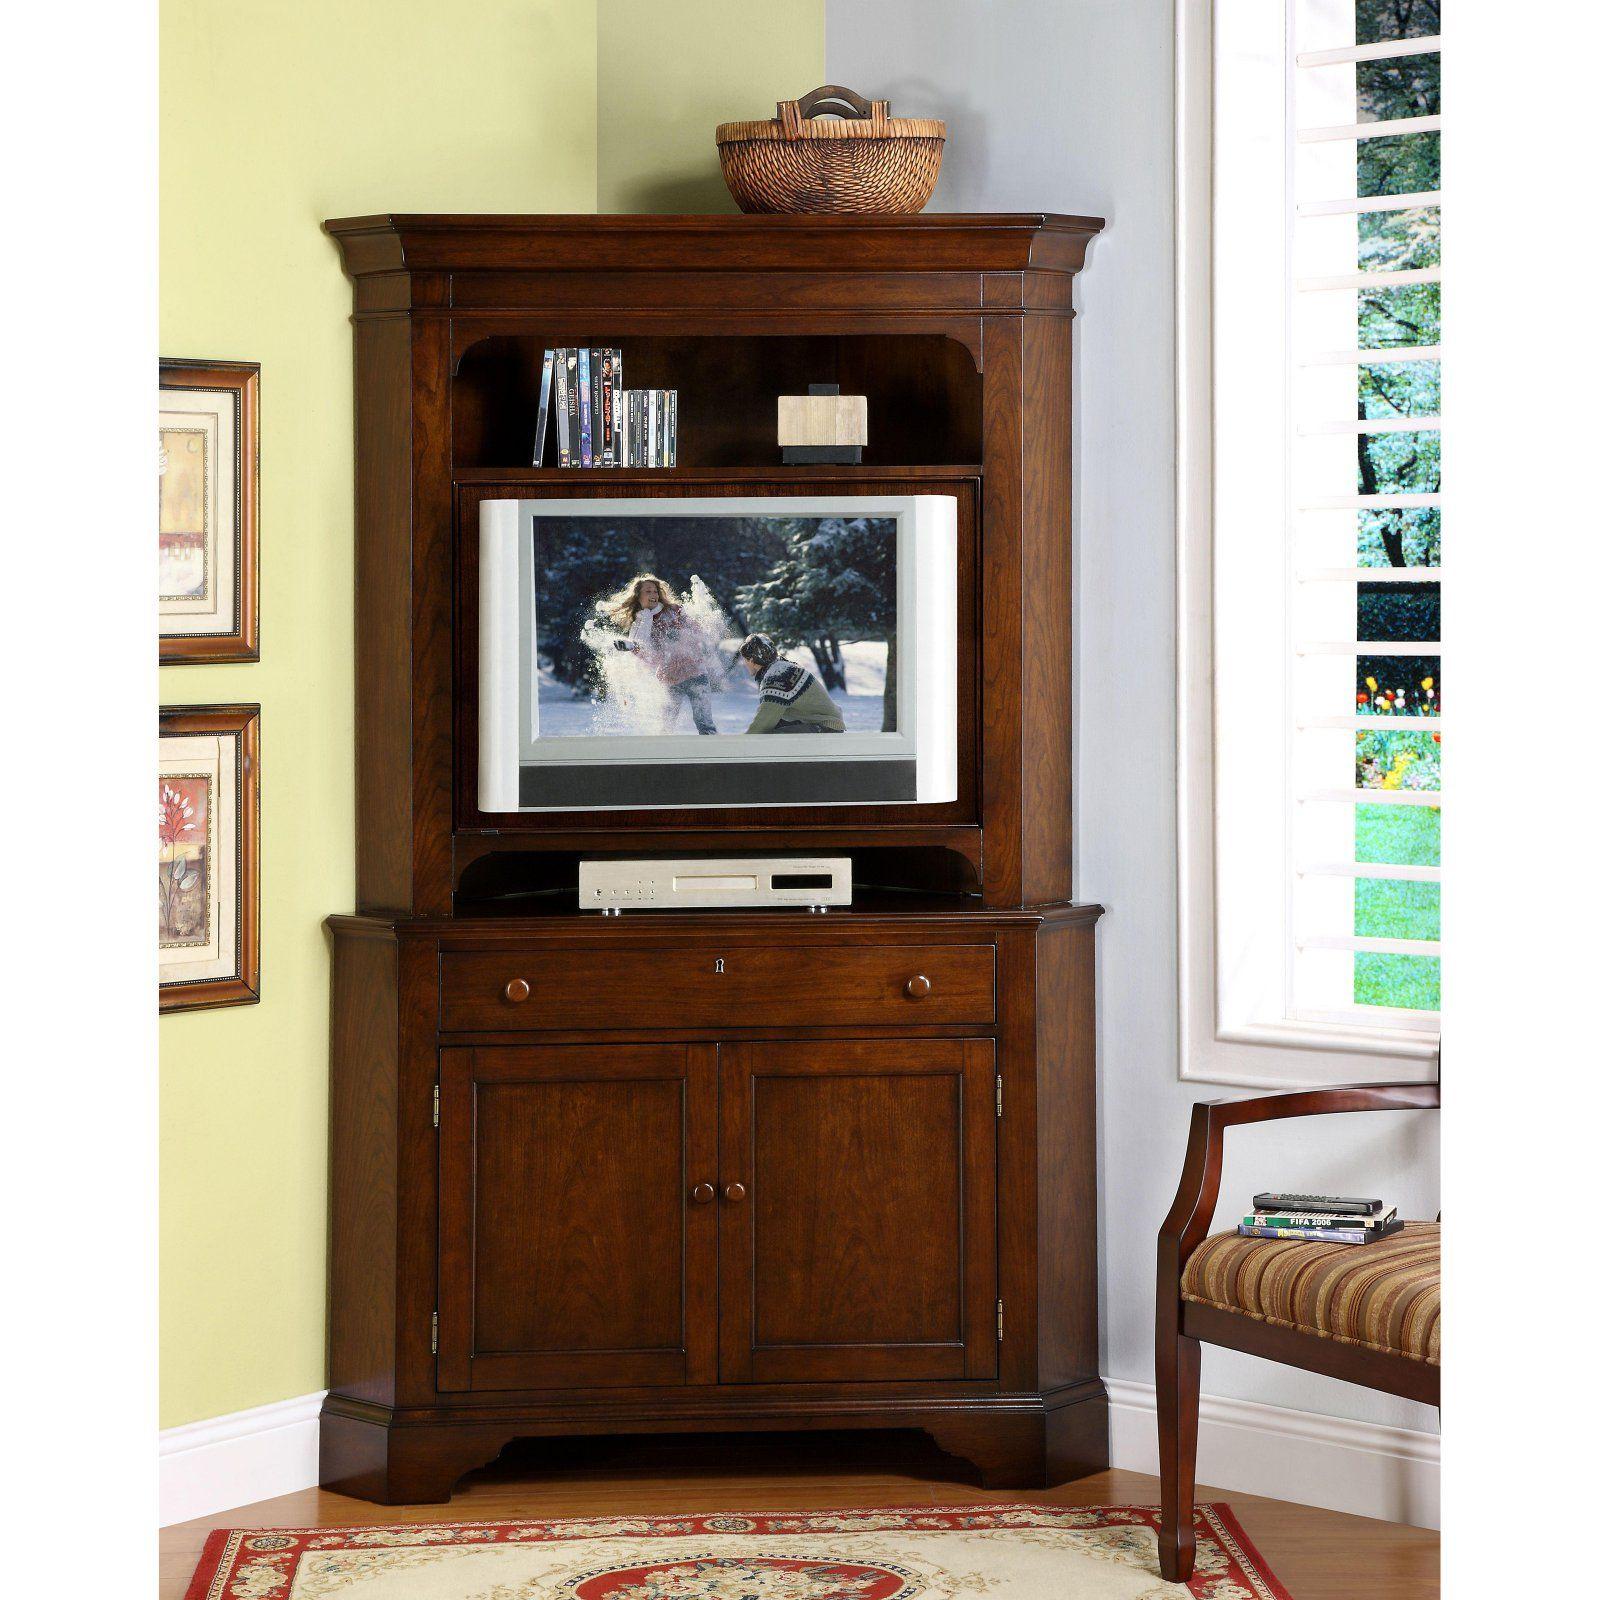 corner tv armoire. corner tv armoire   TV cabinets   Pinterest   Tv armoire  Corner